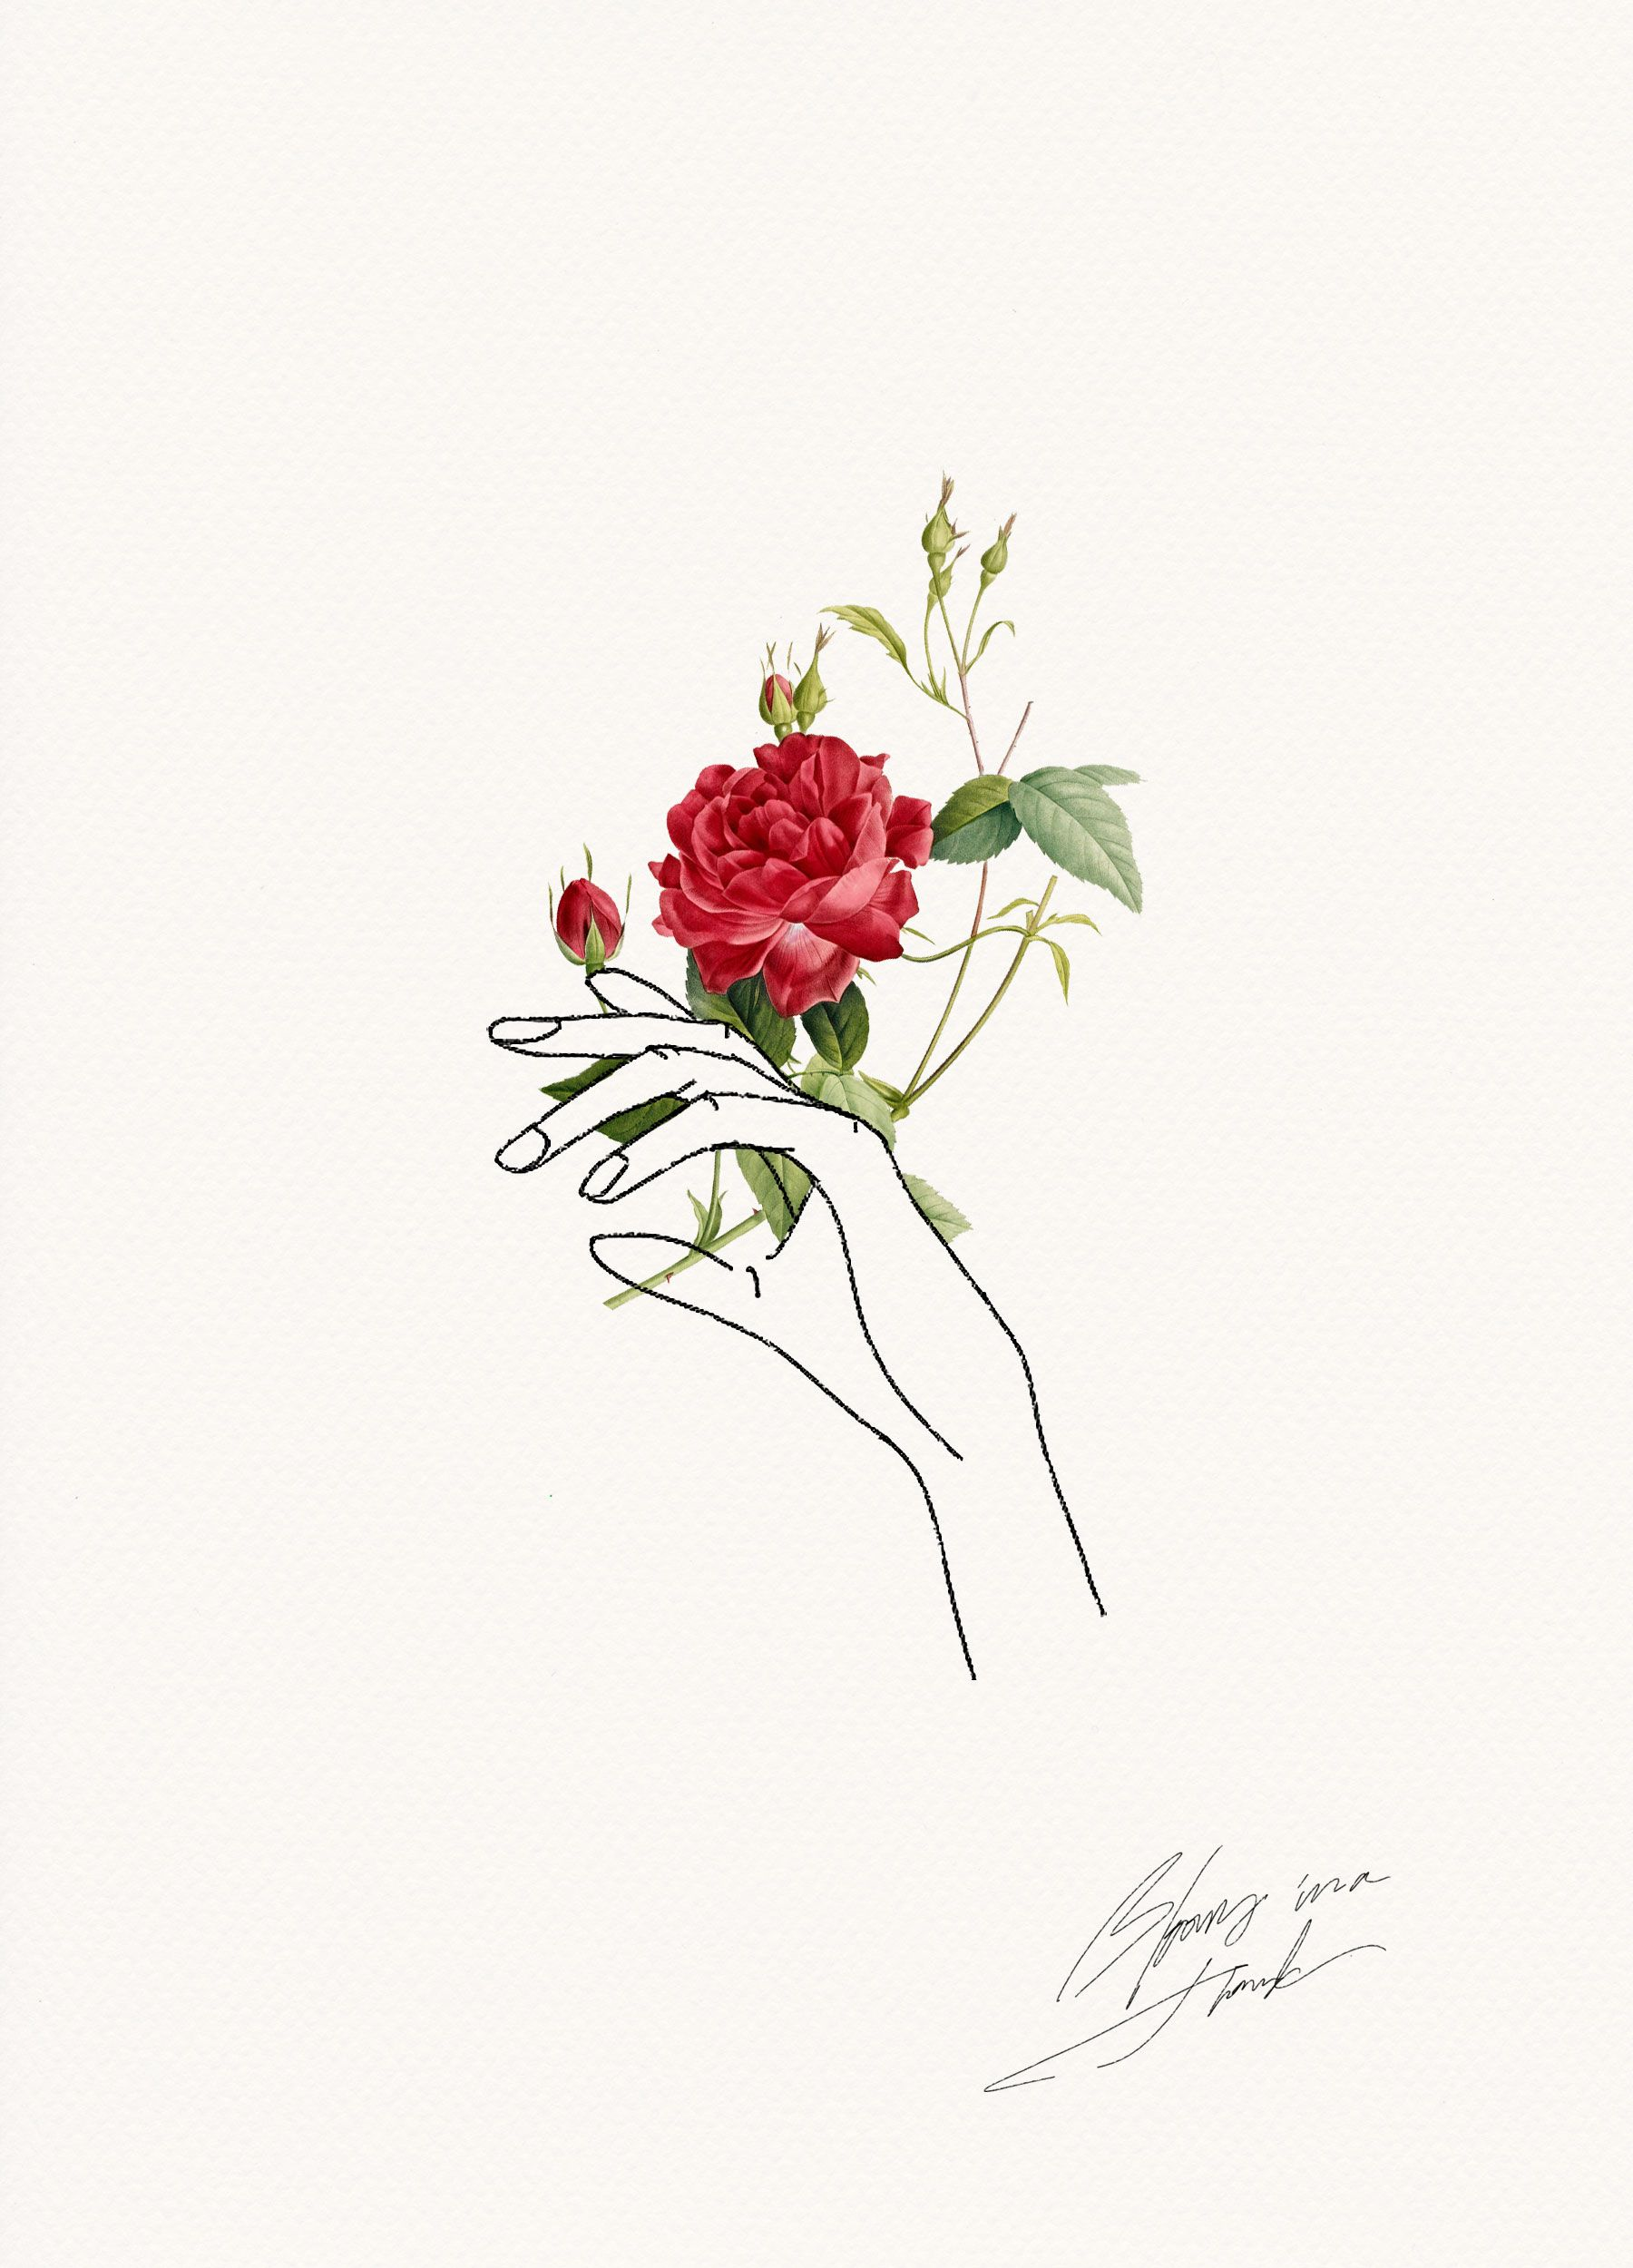 holding flowers design pinterest art drawings and line art rh pinterest com